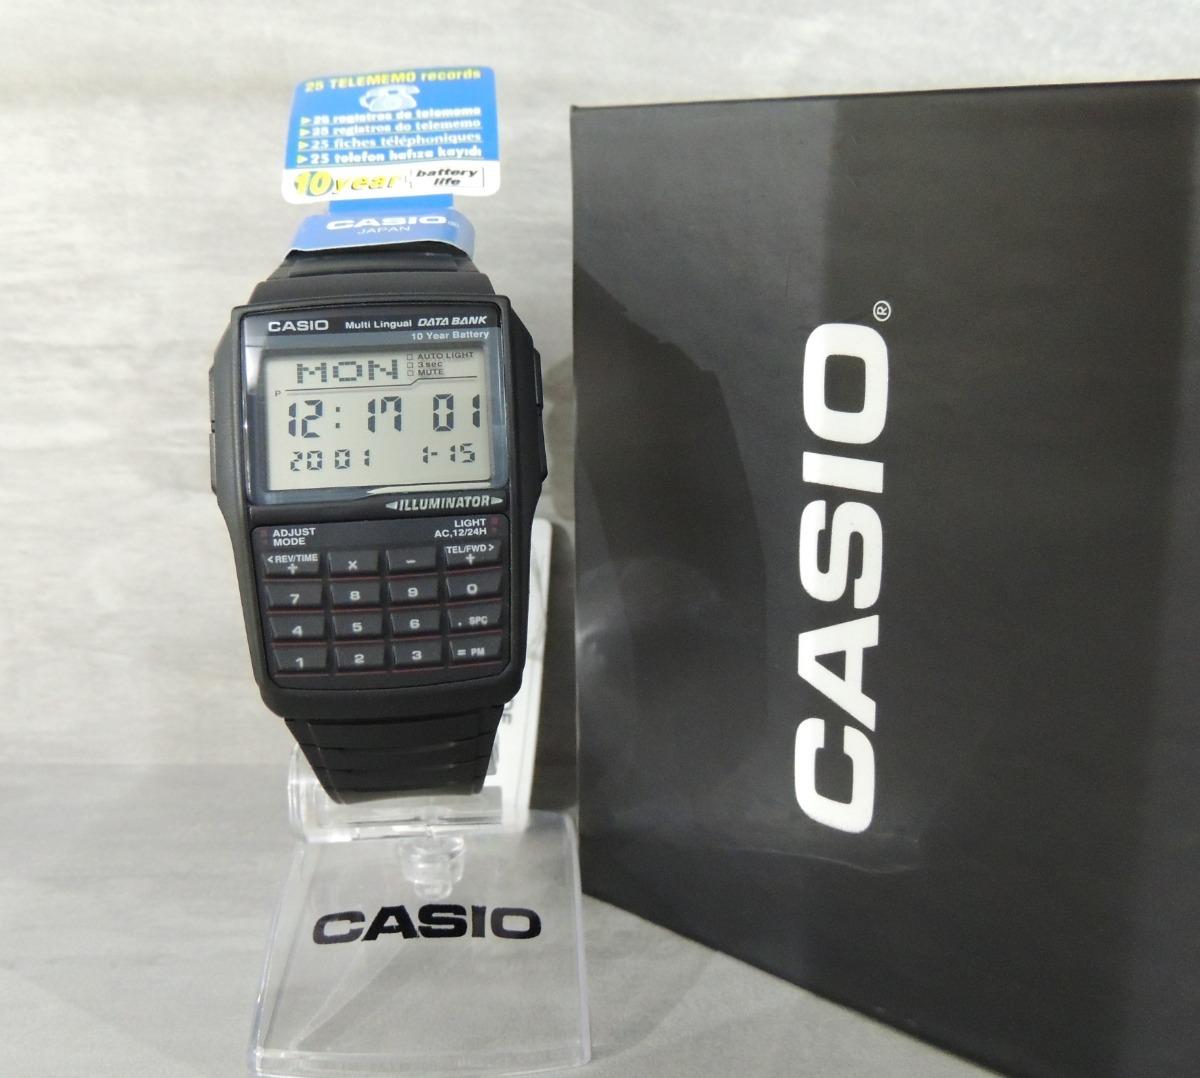 53dacf322eb Relógio Casio Data Bank Calculadora Dbc-32-1adf-(gar E Nf) - R  298 ...